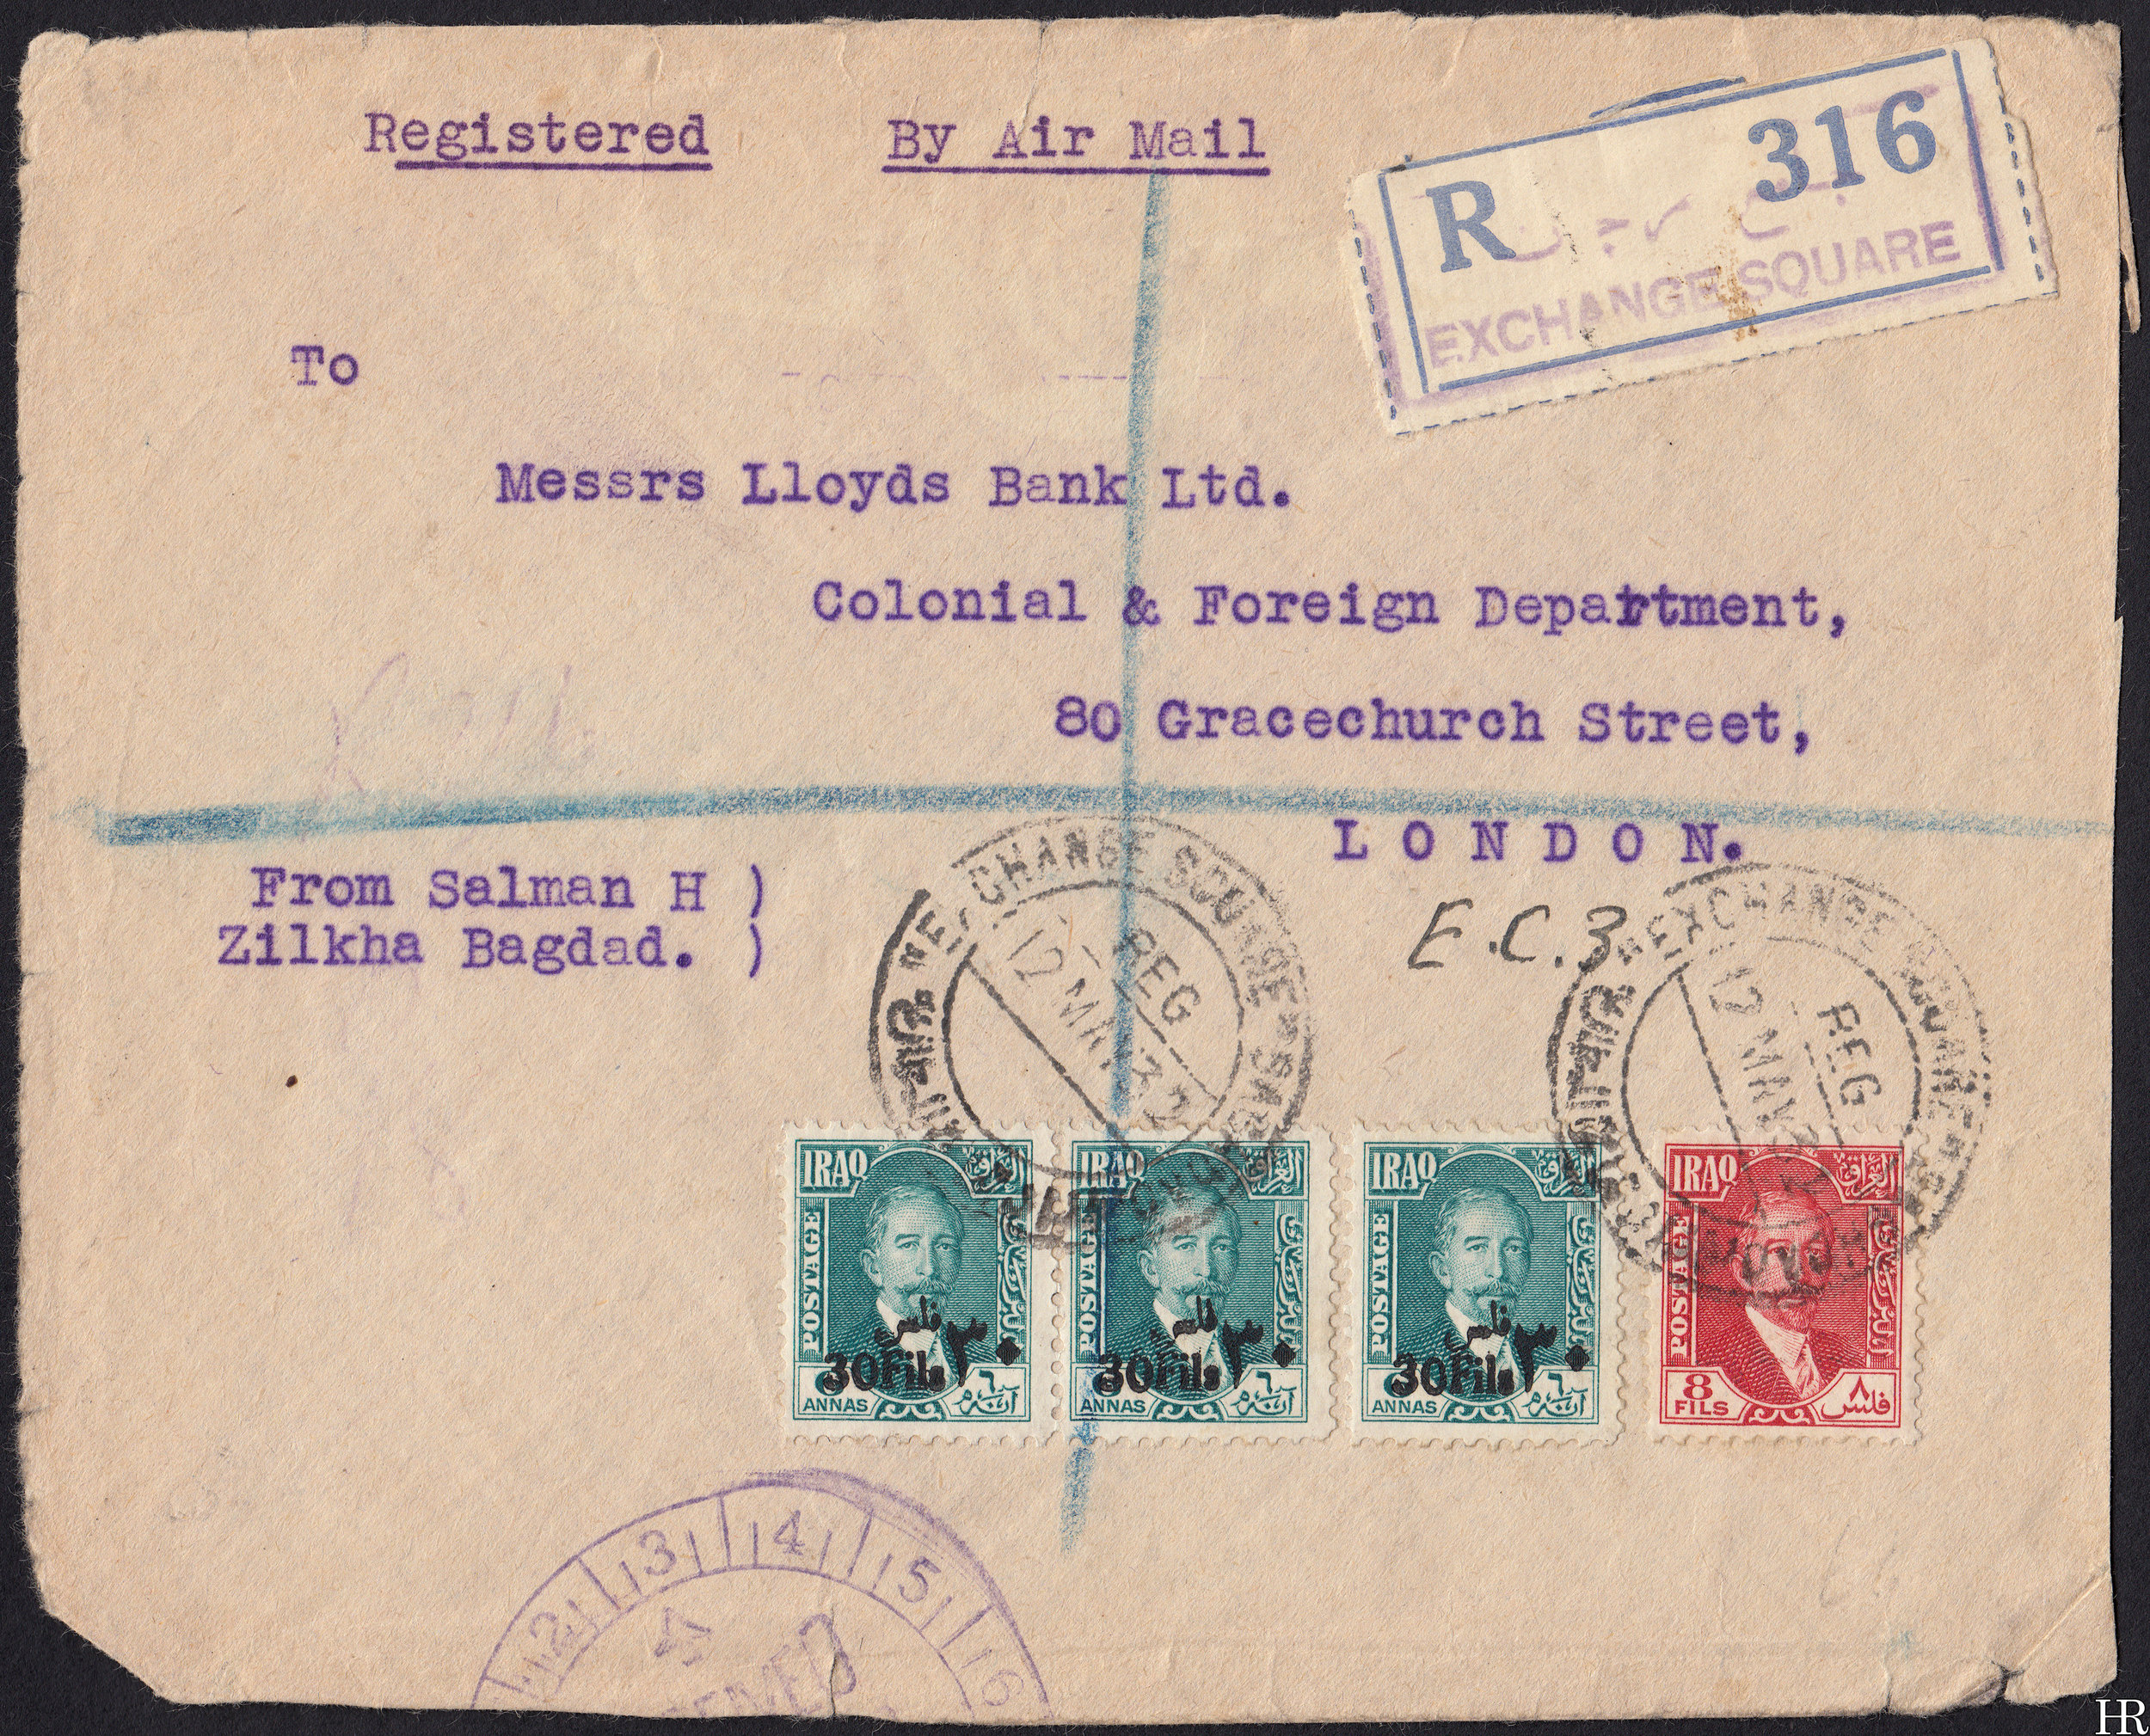 C-IRAQ-1932-Baghdad Exchange Square-1a.jpg